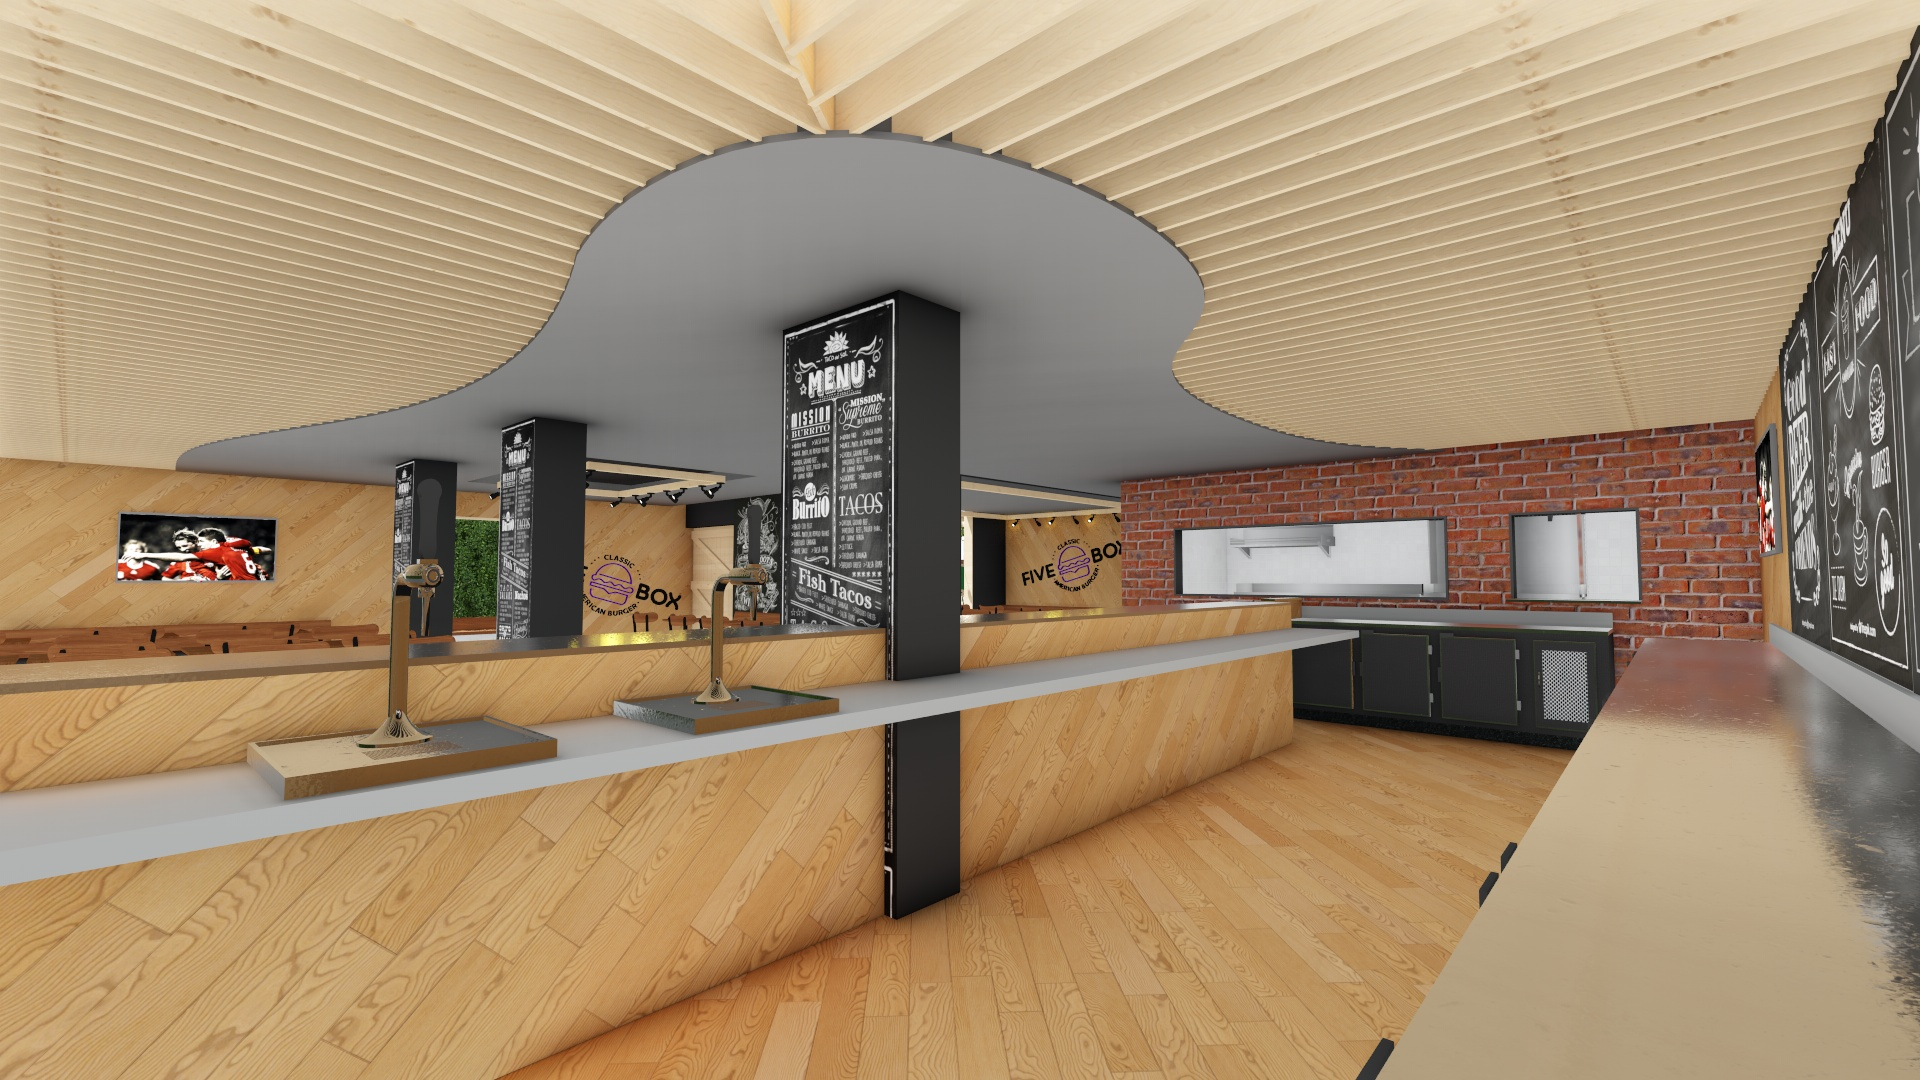 projeto-arquitetonico-fivebok-duo-arquitetura-015.jpg